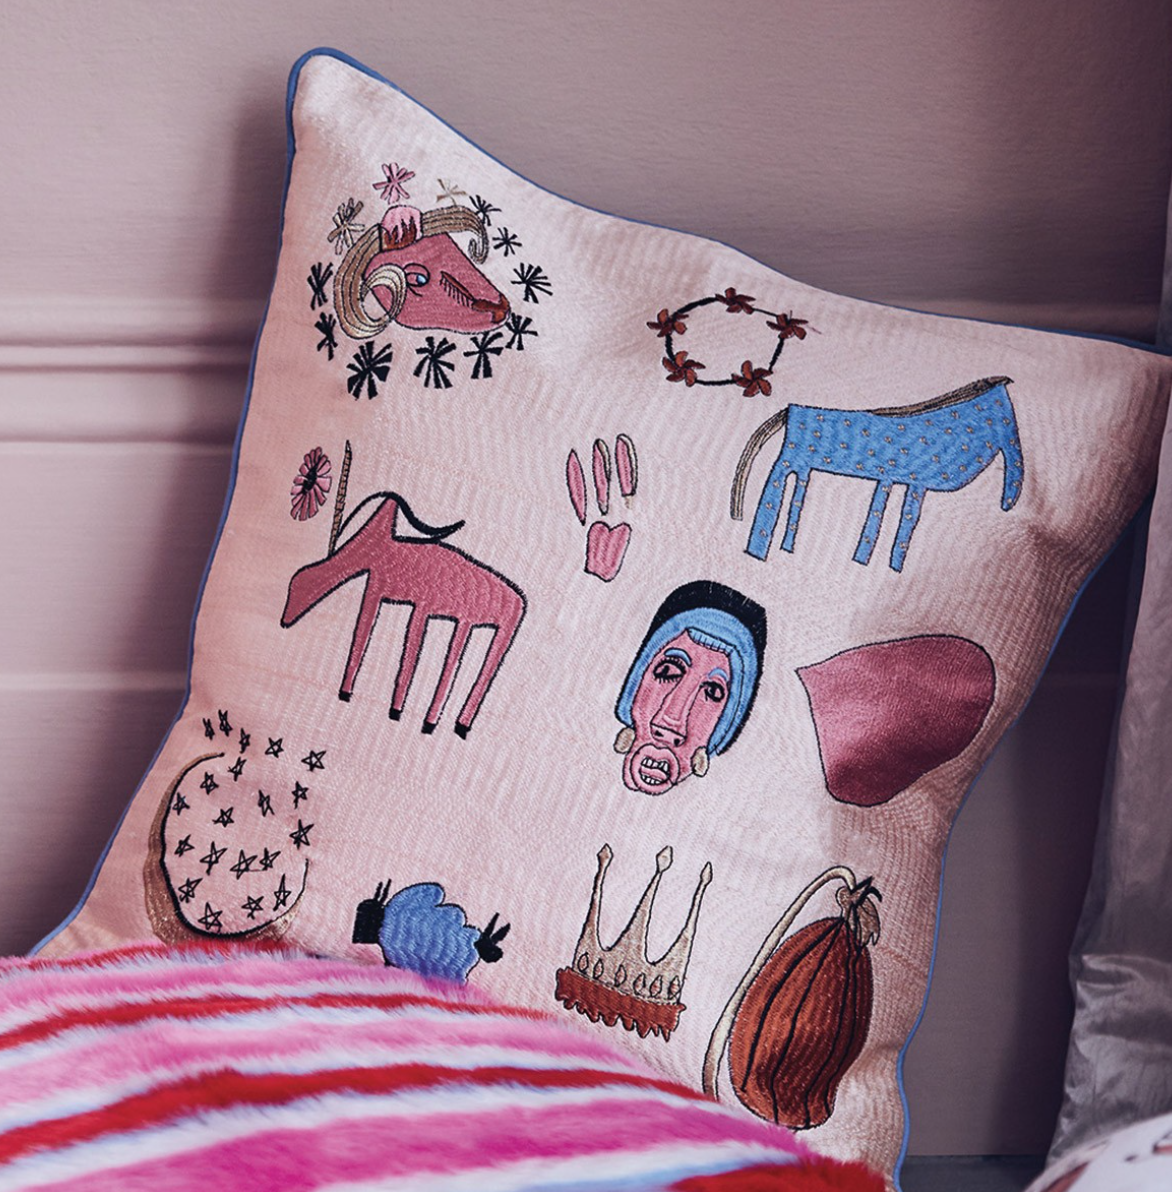 Shrimps for Habitat Embroidered Doodle cushion £70